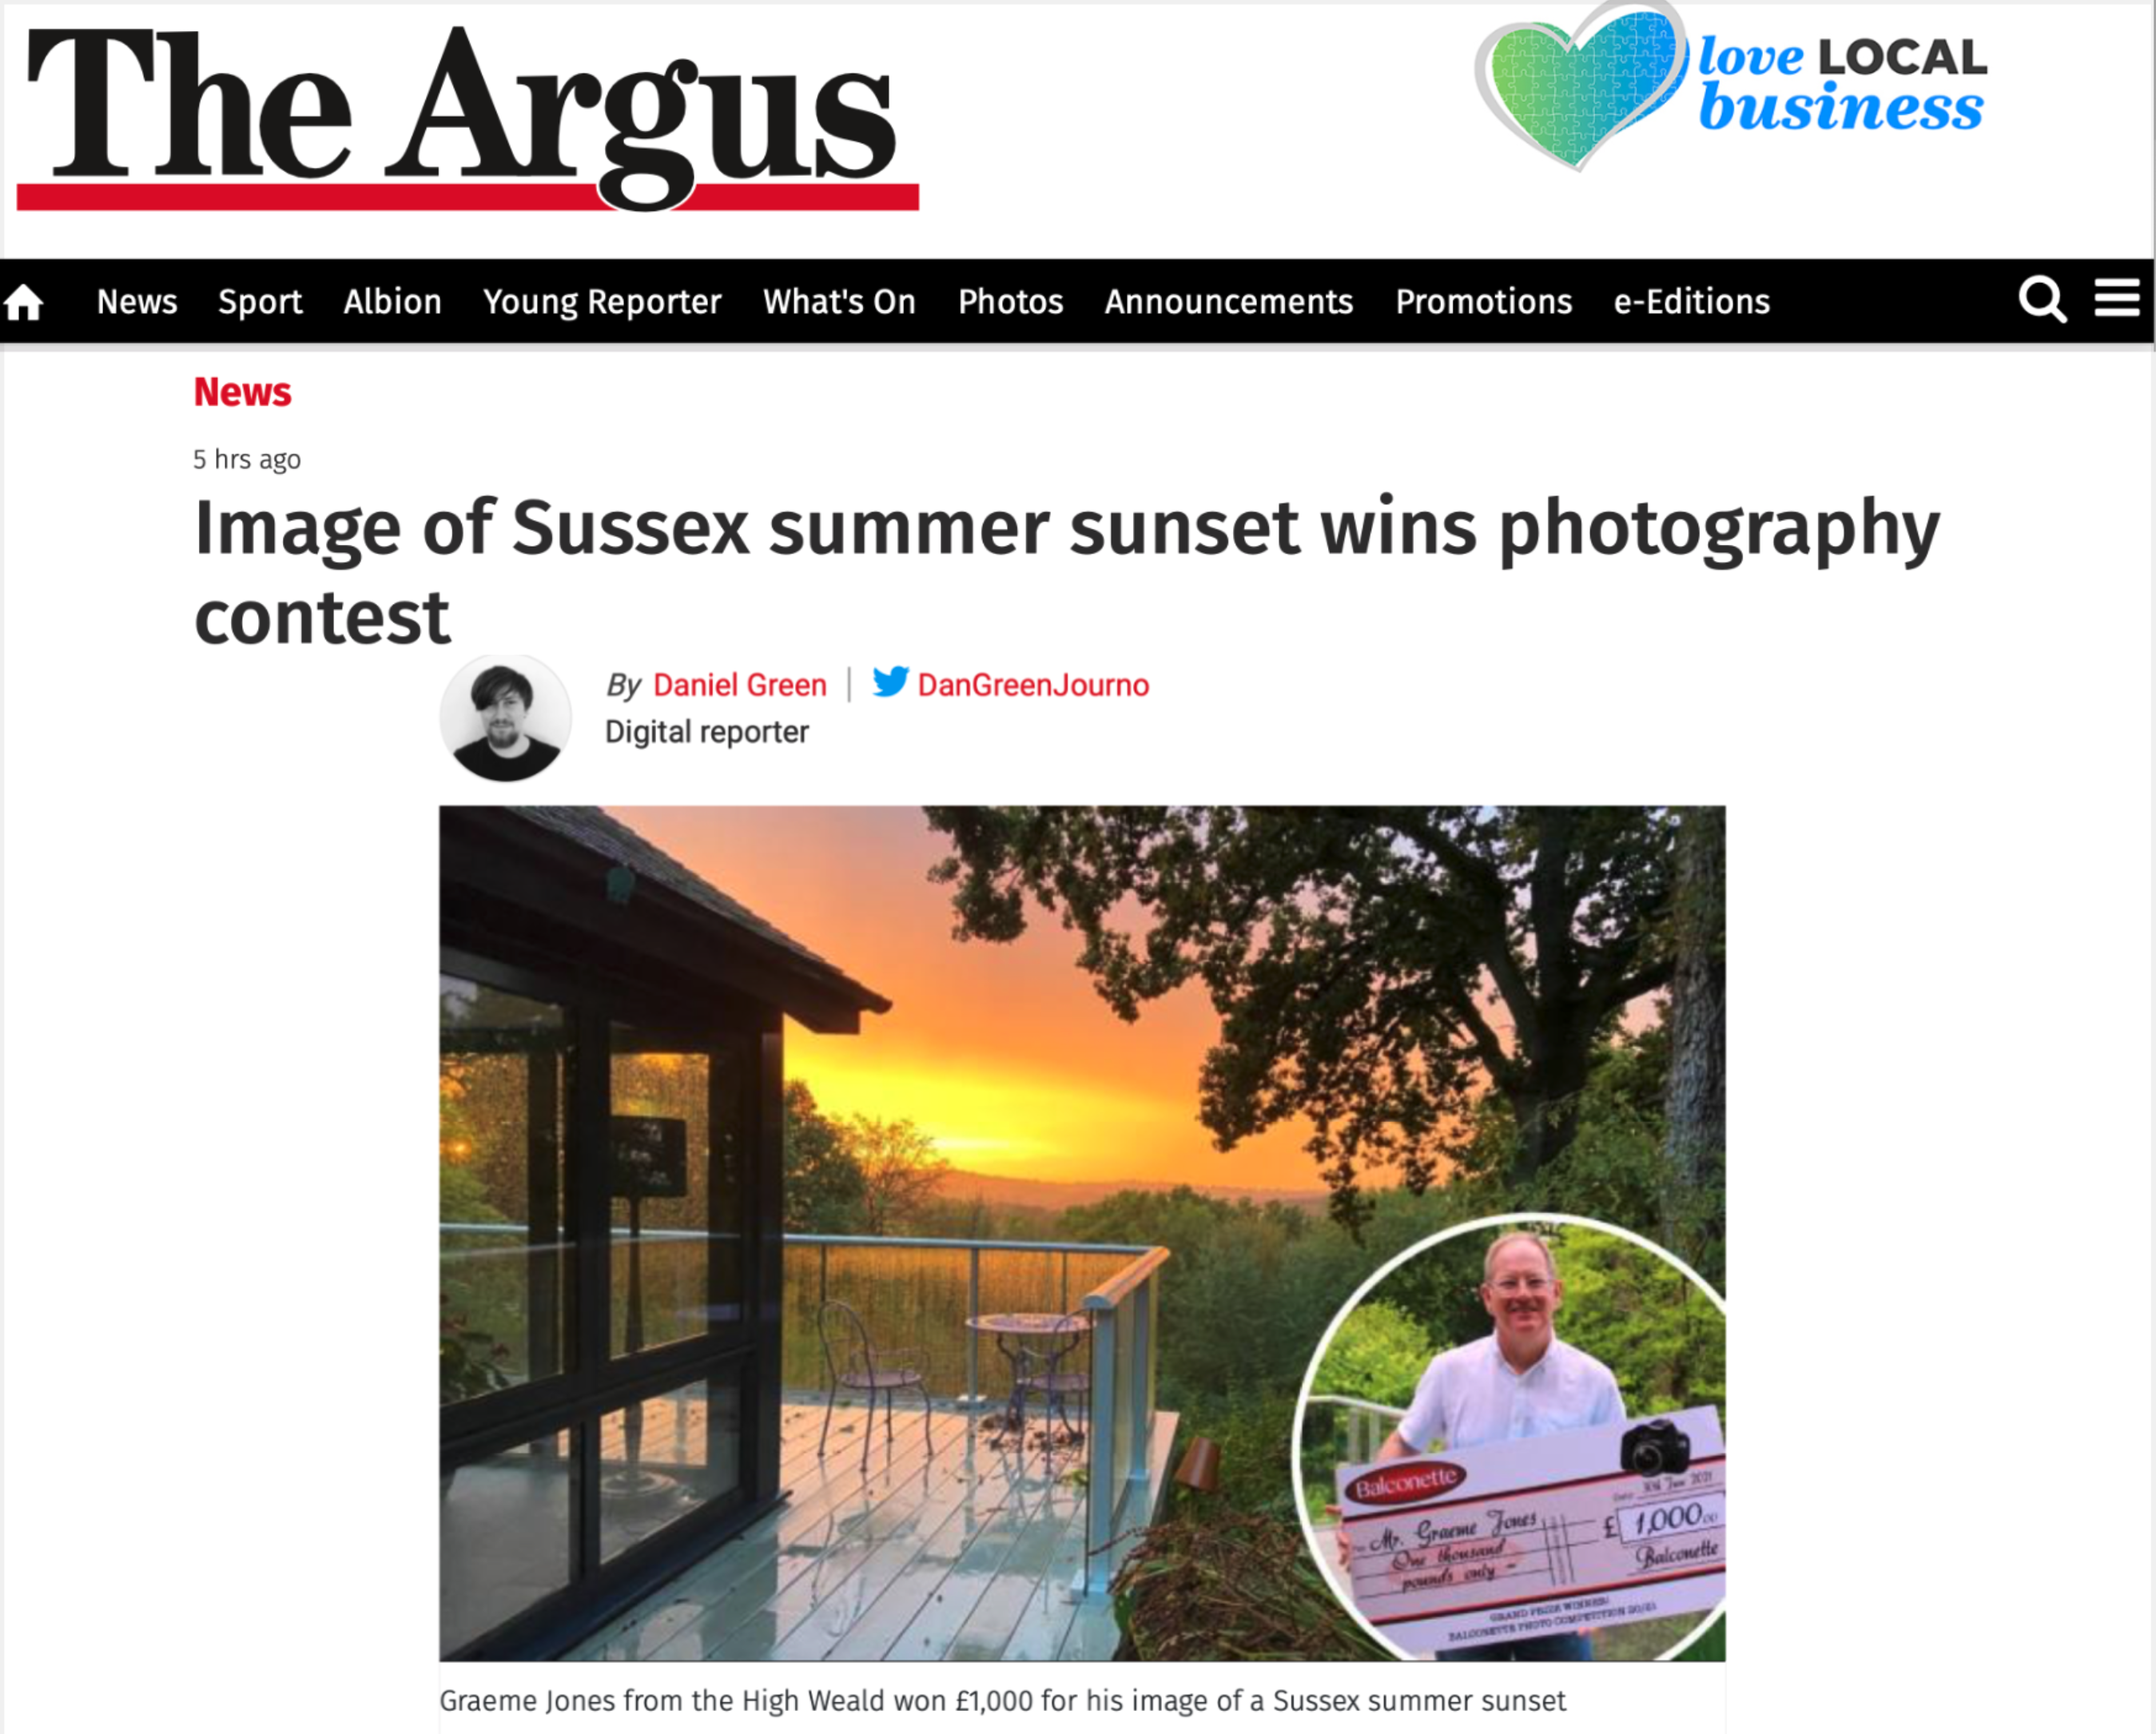 The Argus: Contest Winner